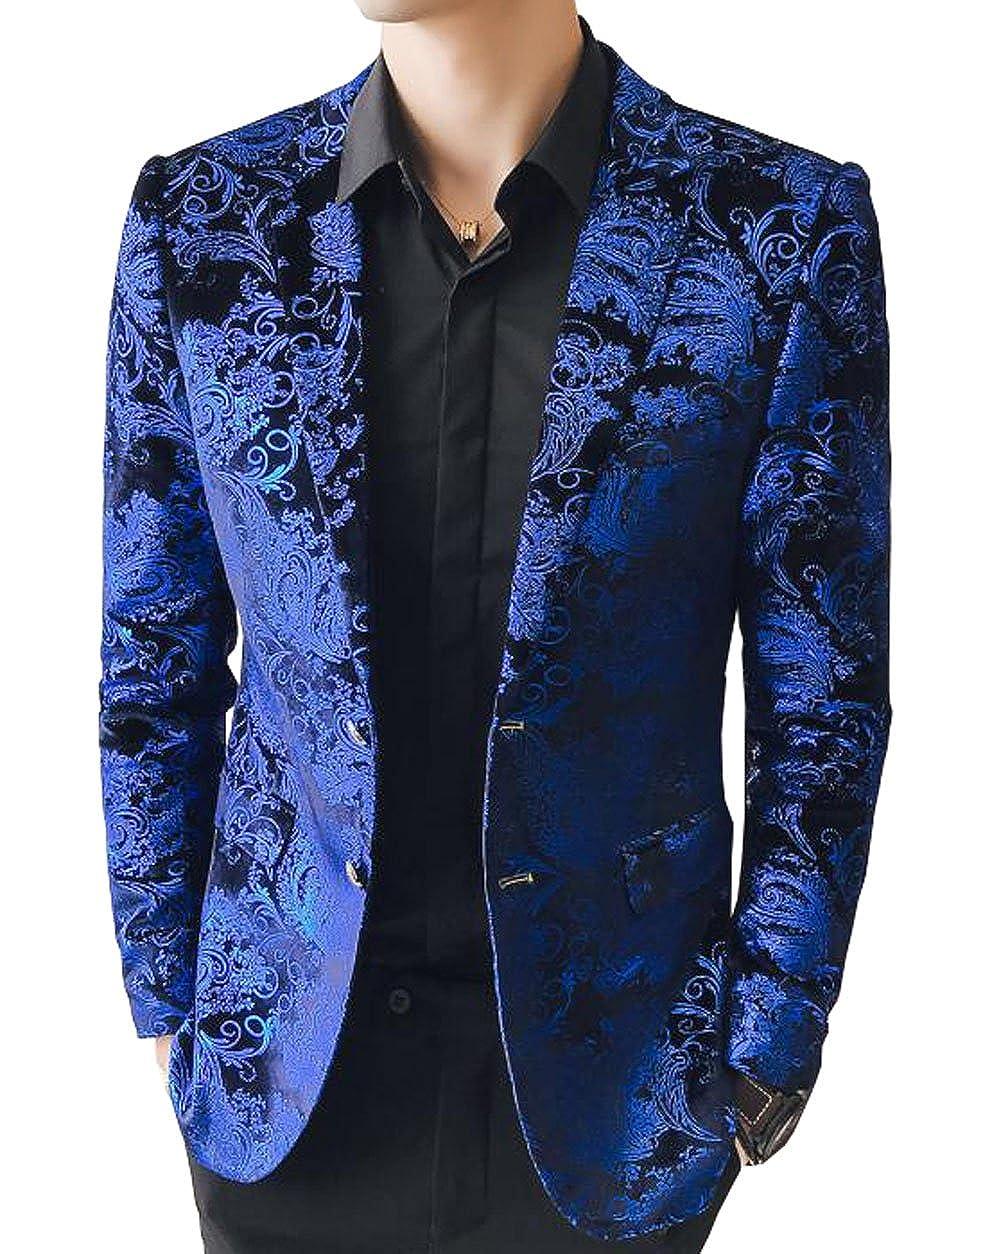 OUYE Uomo Giacca Casual Luxury Blu Oro Stampata Blazer